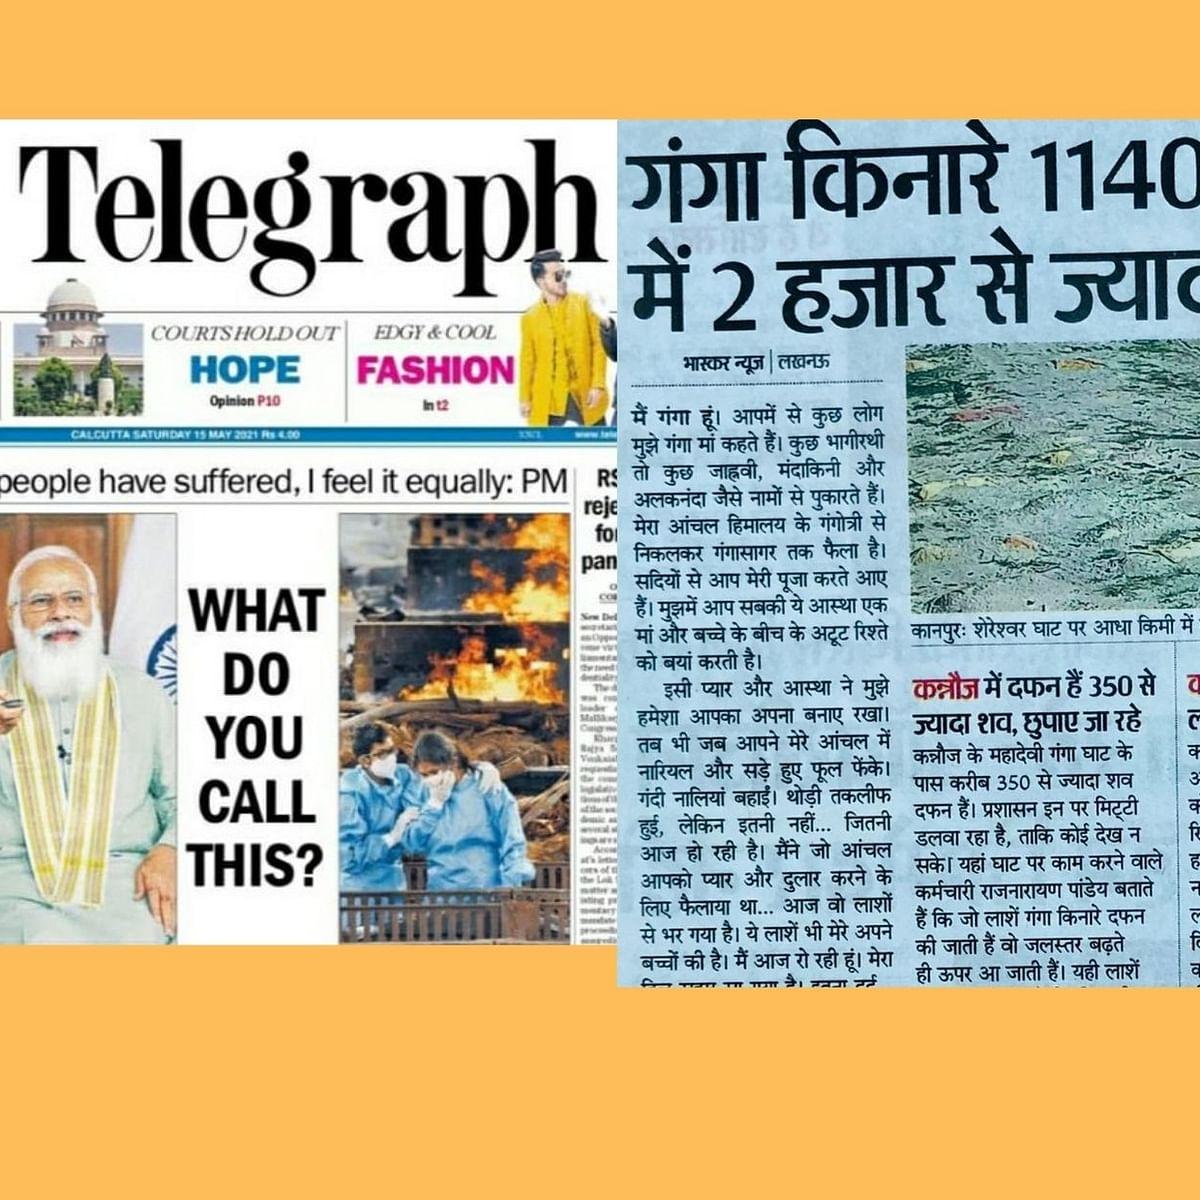 India has paid the price for PM Modi's 'strokes of genius'